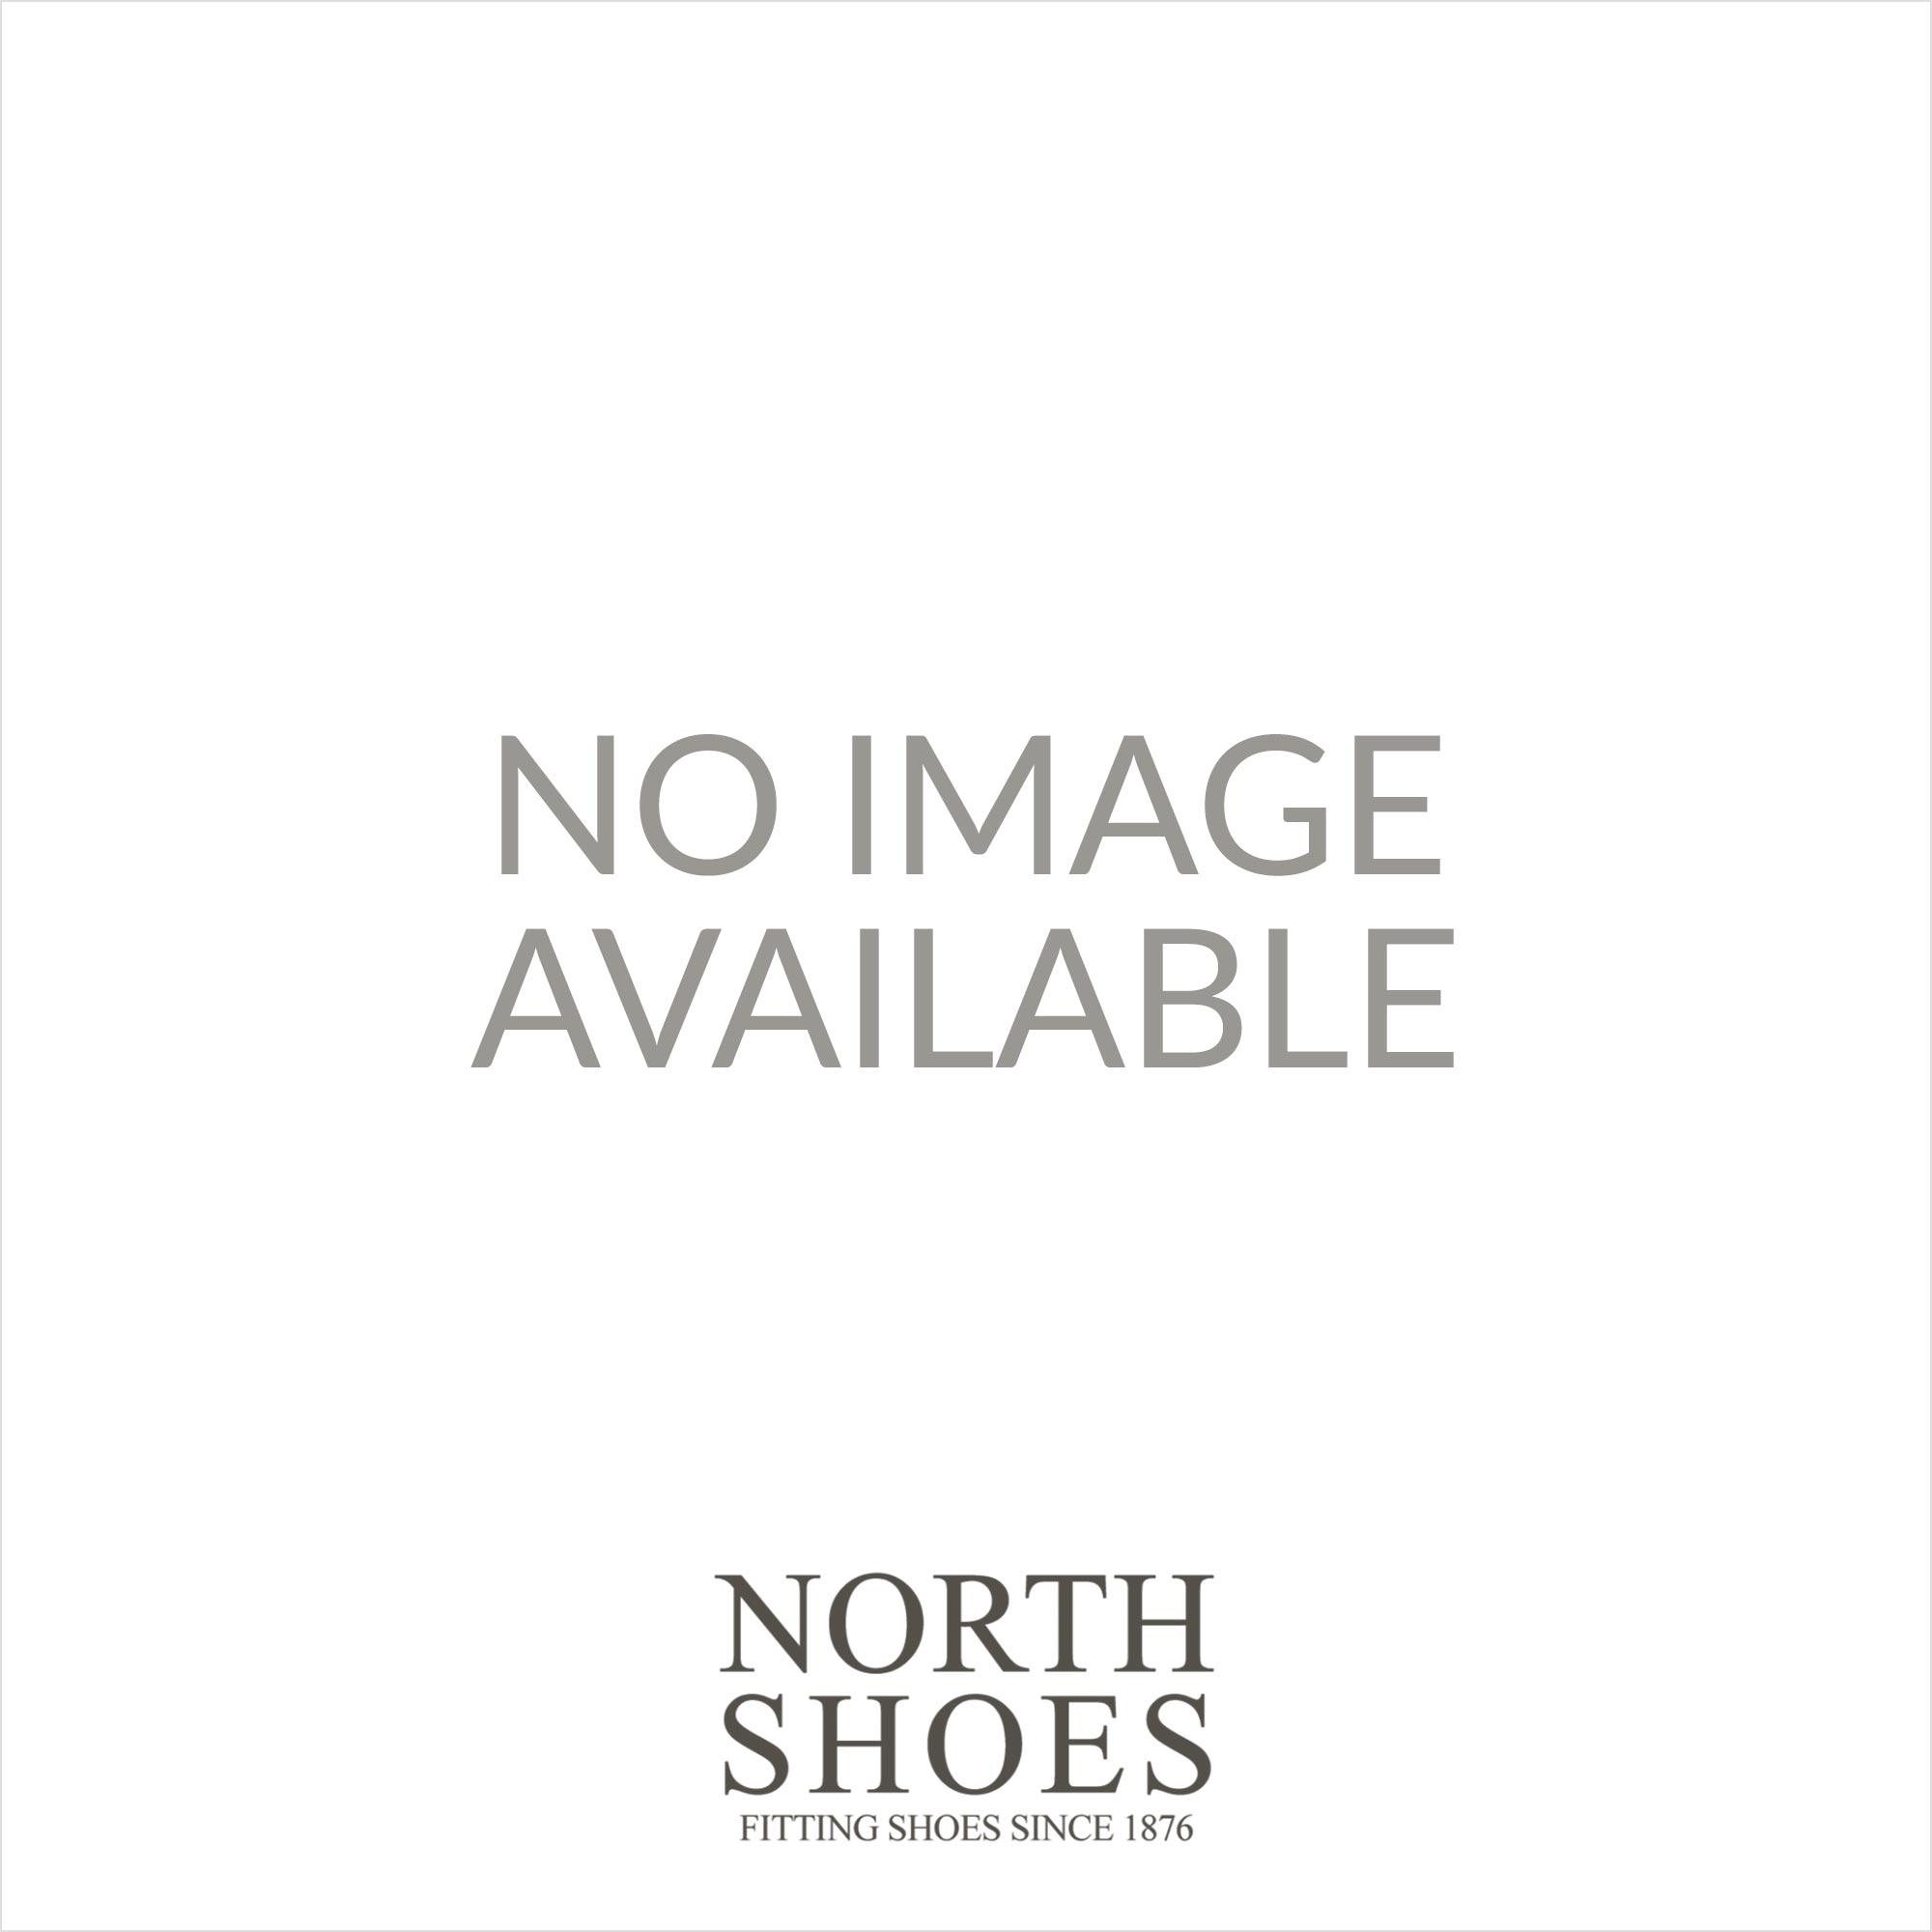 e60e946a87 Aisley Tulip Black Nubuck Leather Womens Wedge Slingback Sandals - UK 7.  Clarks ...